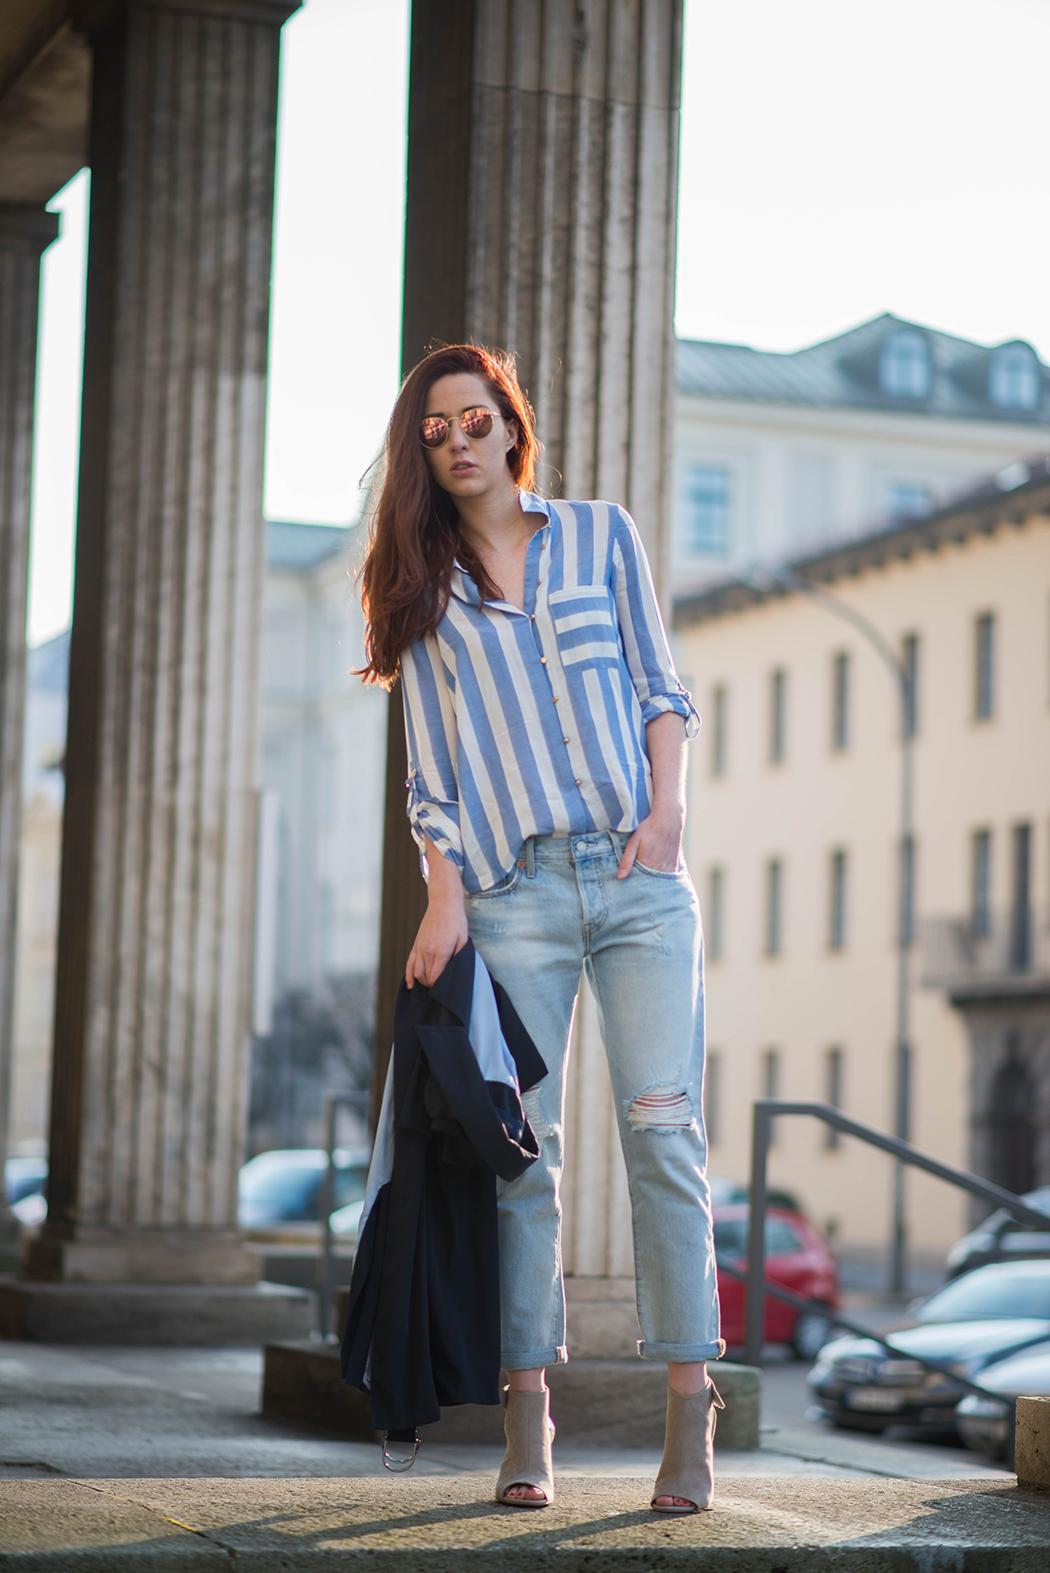 Fashionblogger-Deutschland-Fashionblog-München-Lindarella-Levis-501CT-Marinelook-Ripped-Jeans-Lindarella-9